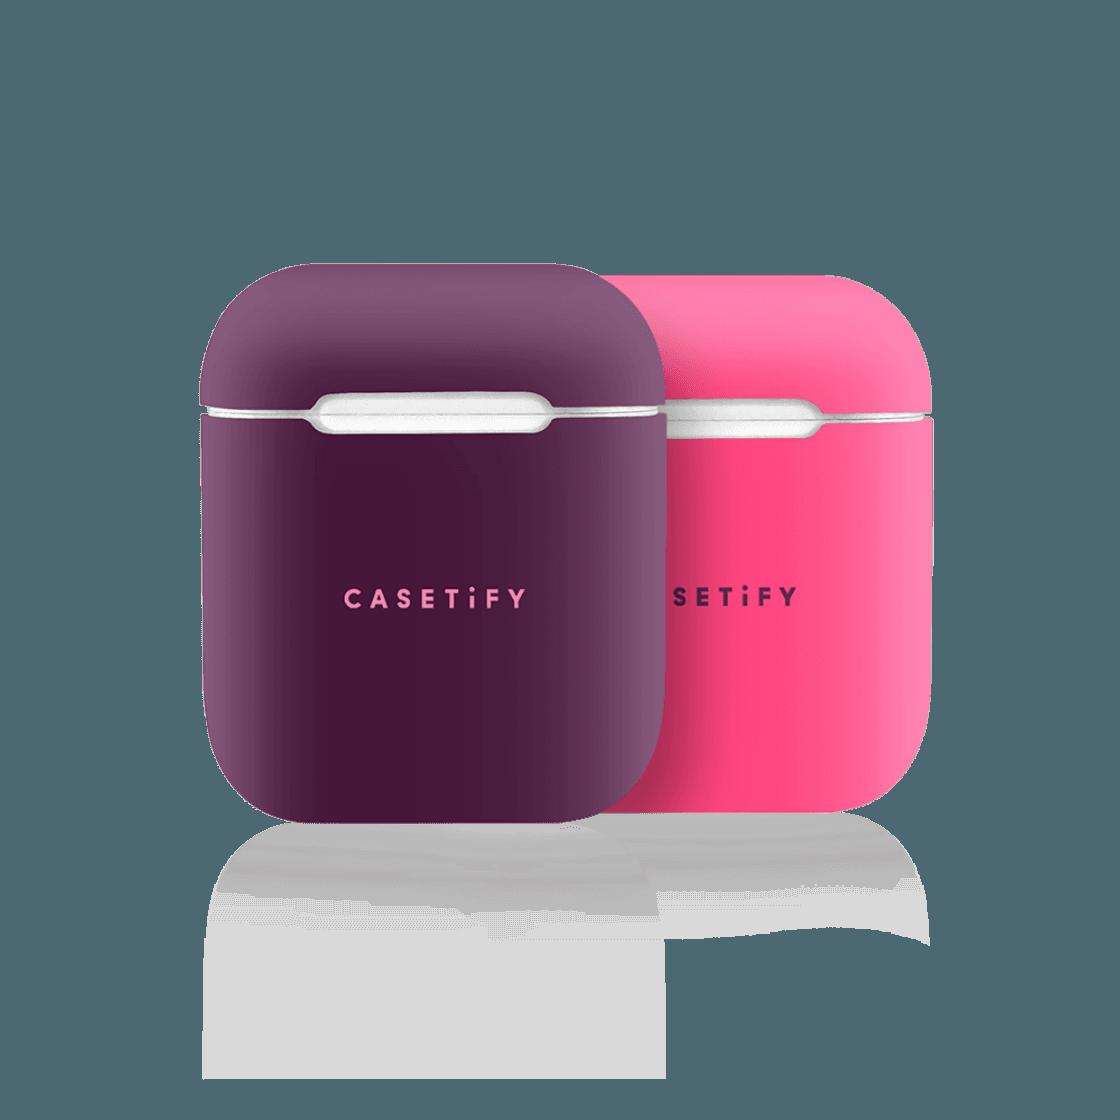 iPhone 7 Plus/7/6 Plus/6/5/5s/5c Case - Neon AirPods Case Skin (2 sets) Purple/Pink